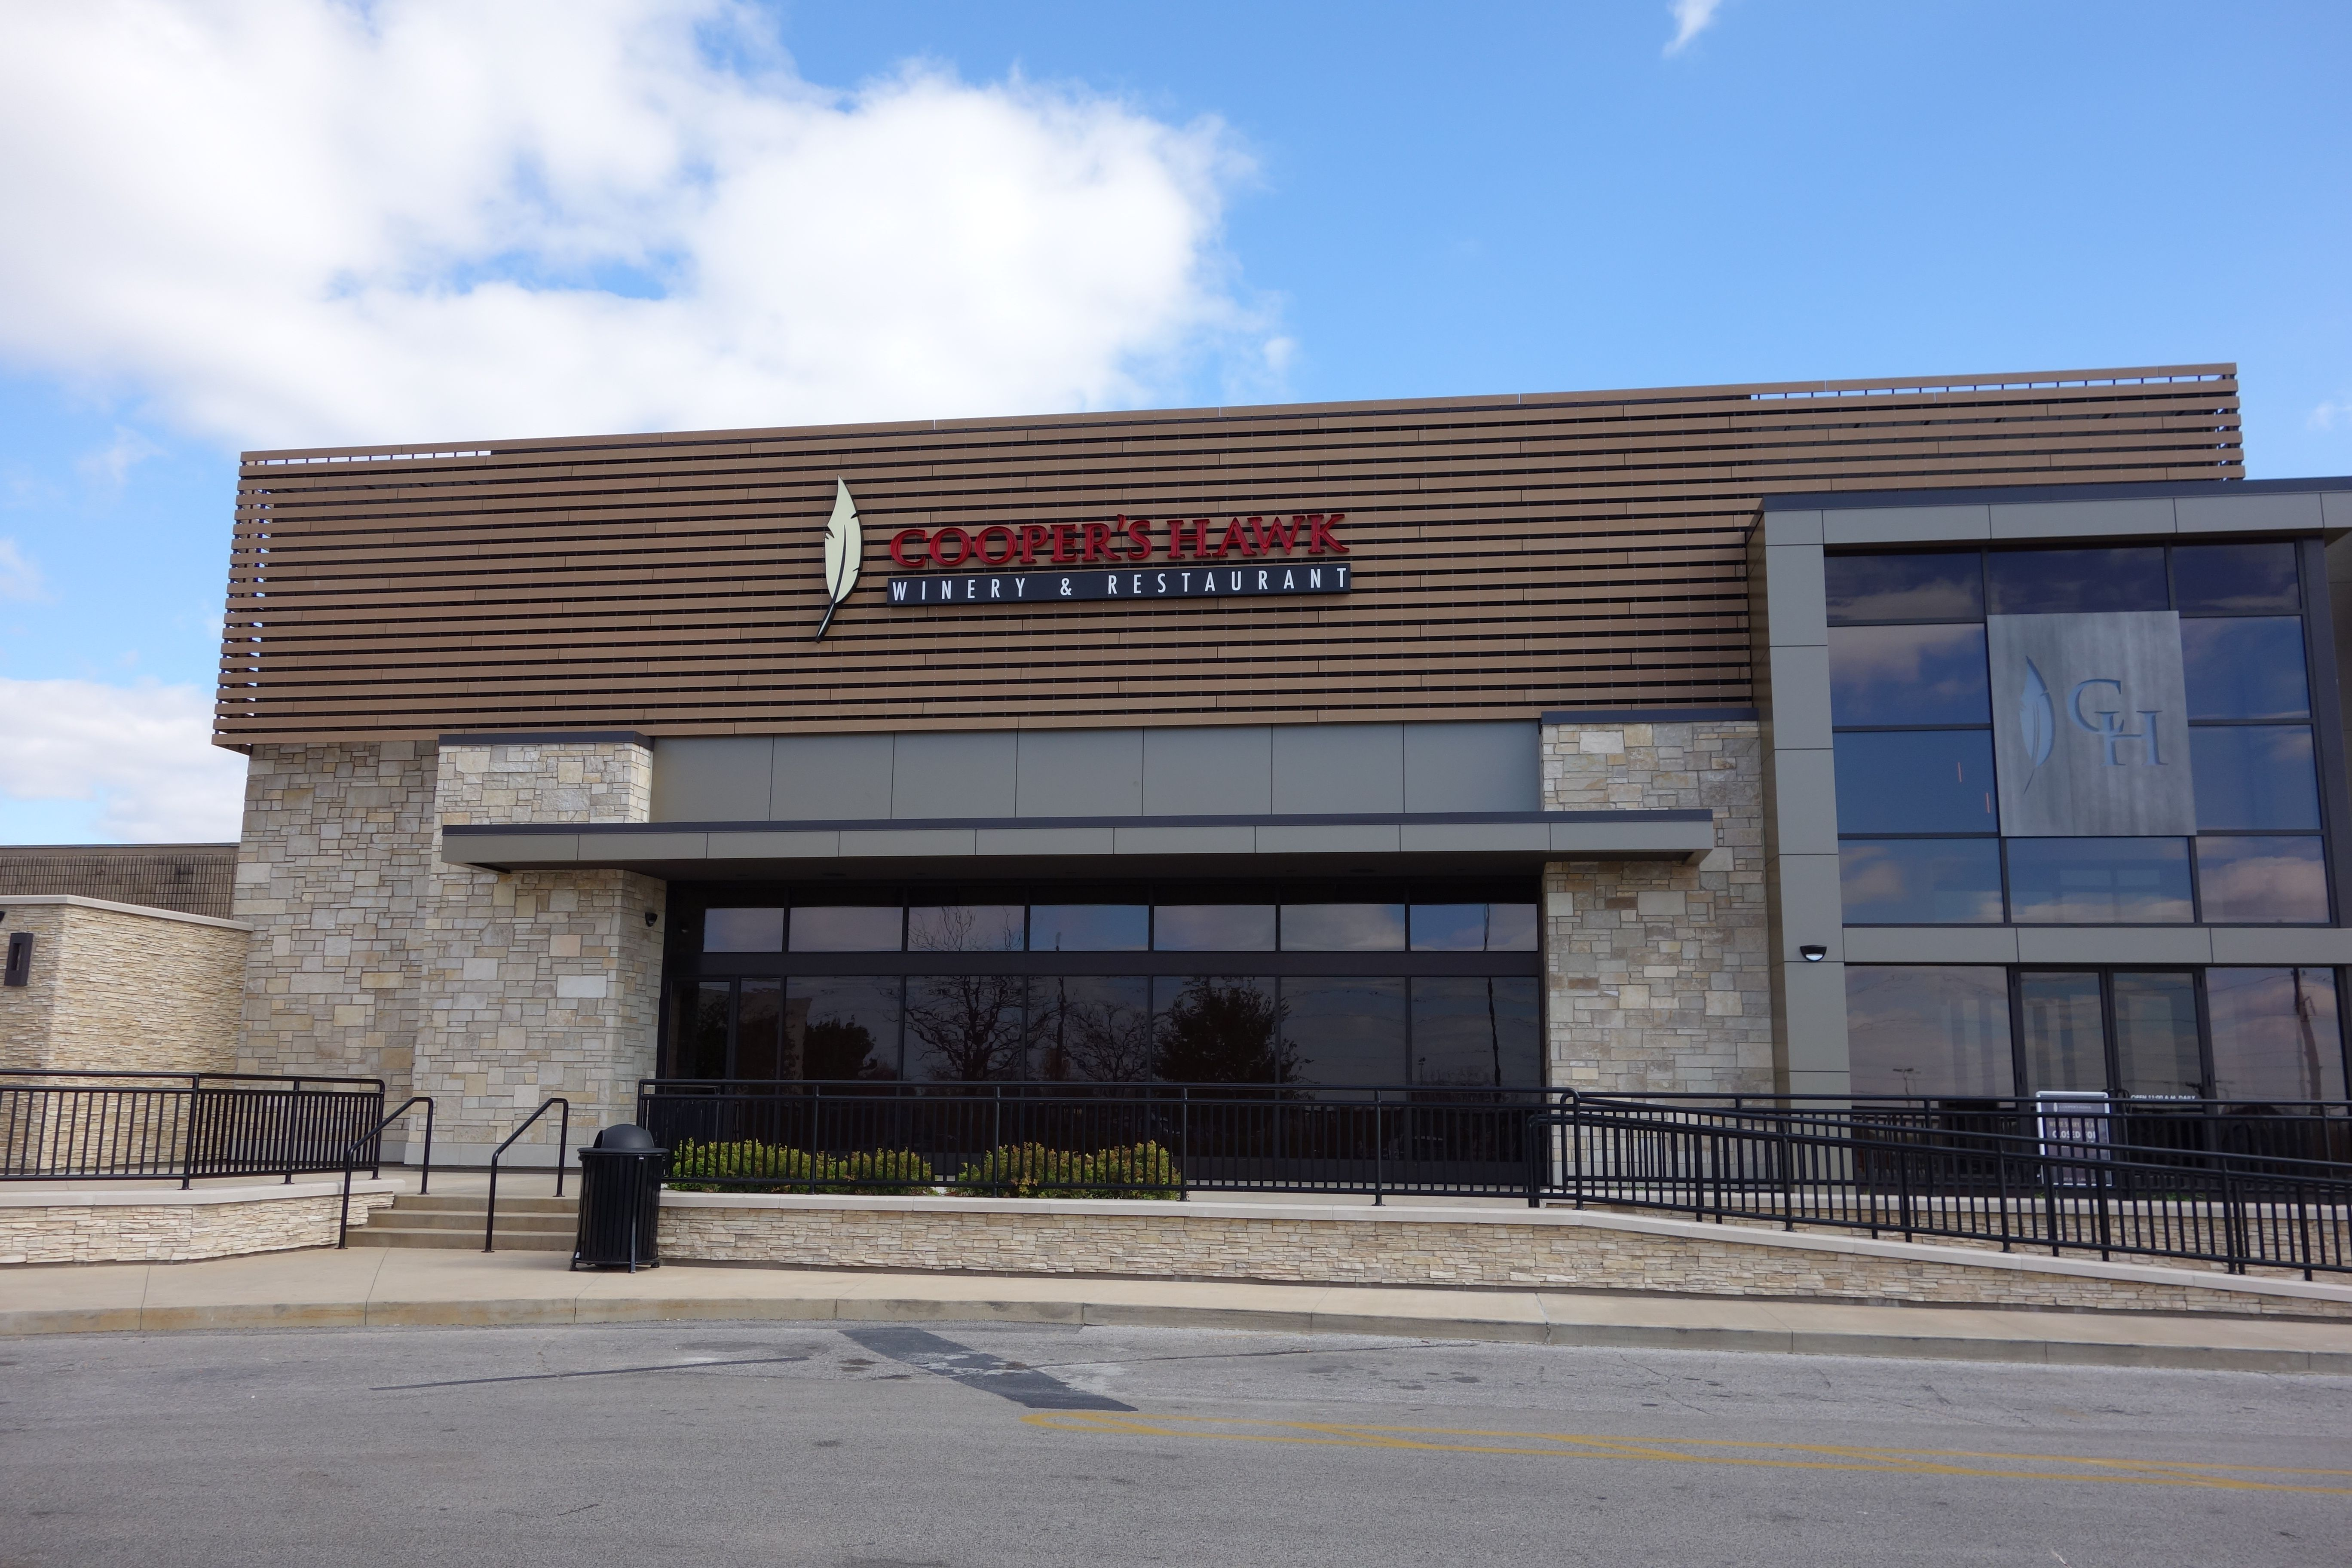 View source image restaurant exterior grill restaurant